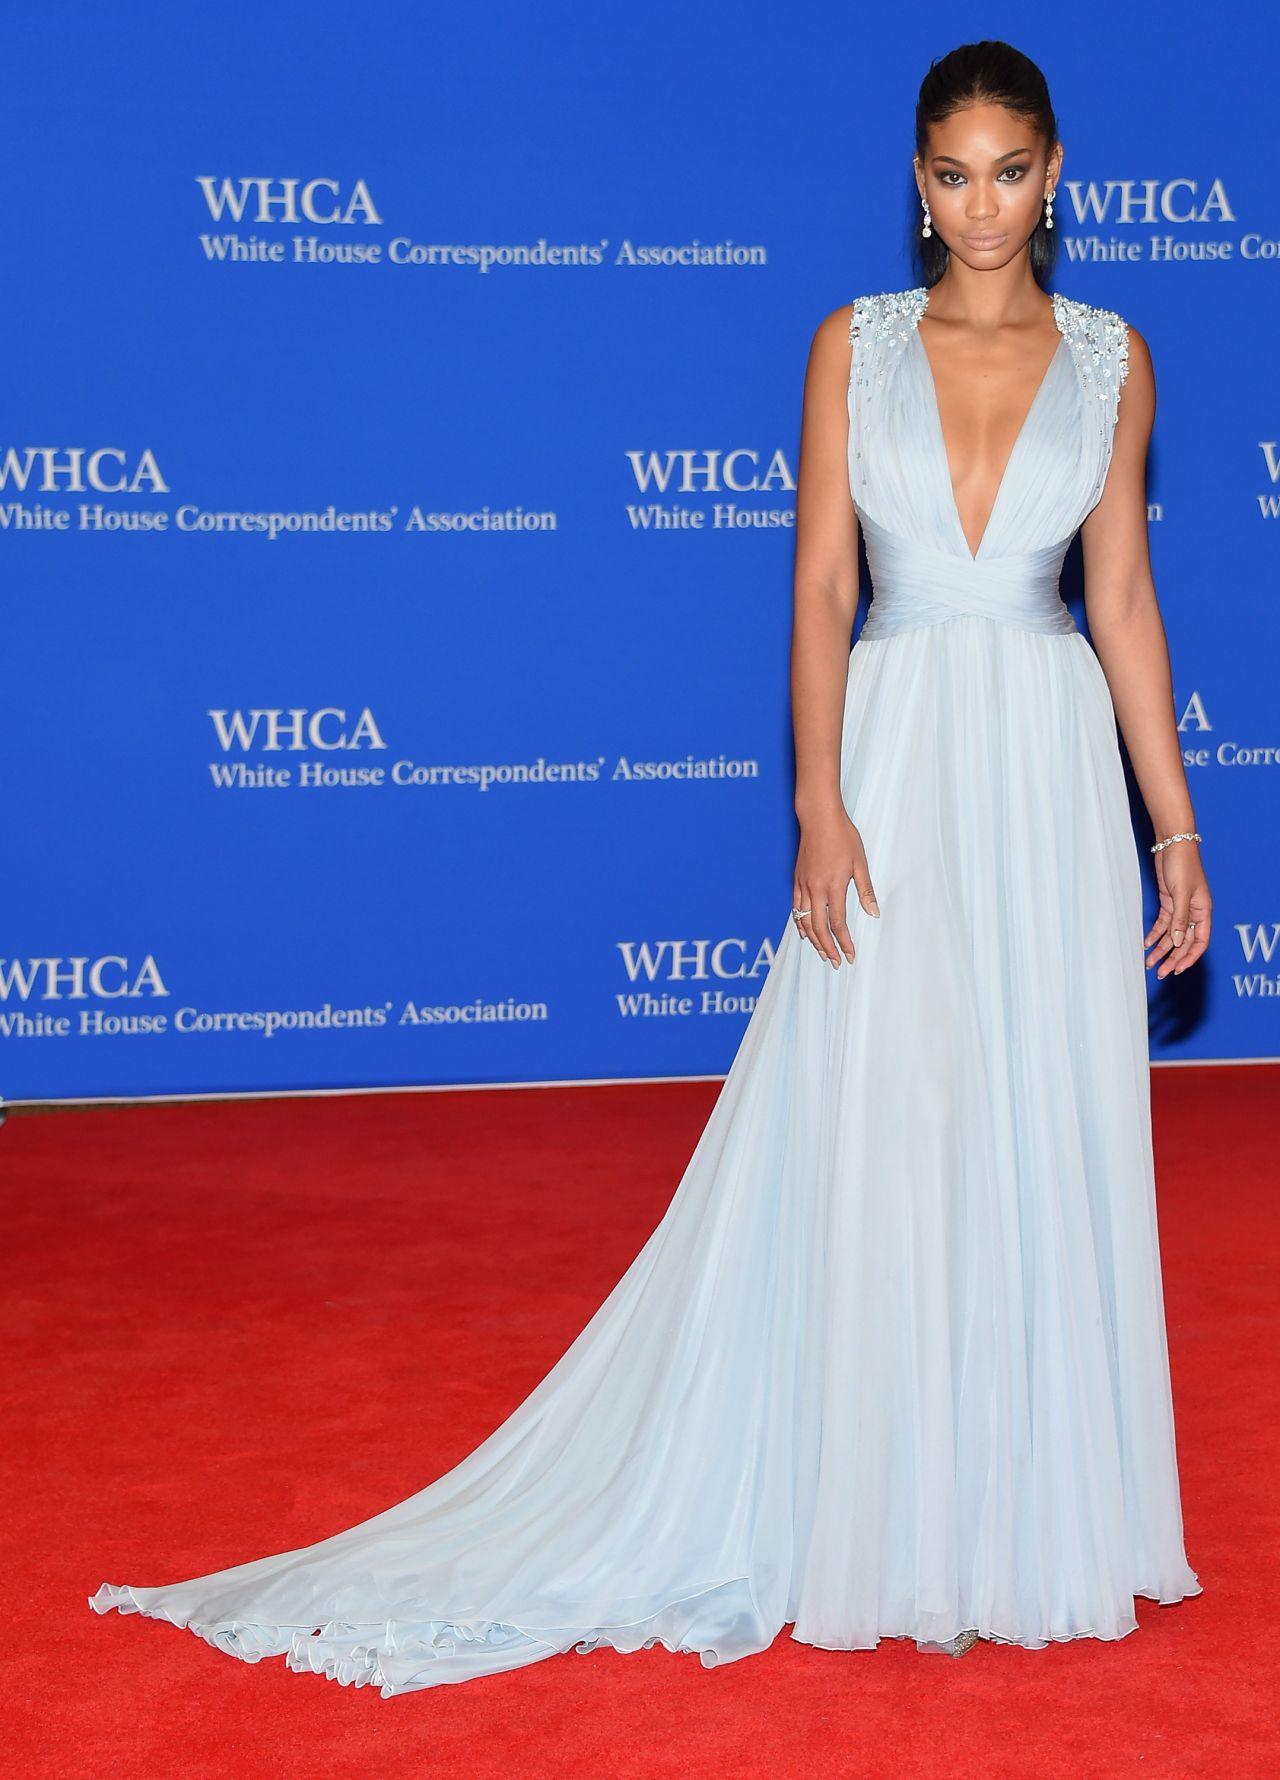 Chanel Iman 2015 White House Correspondents Dinner In